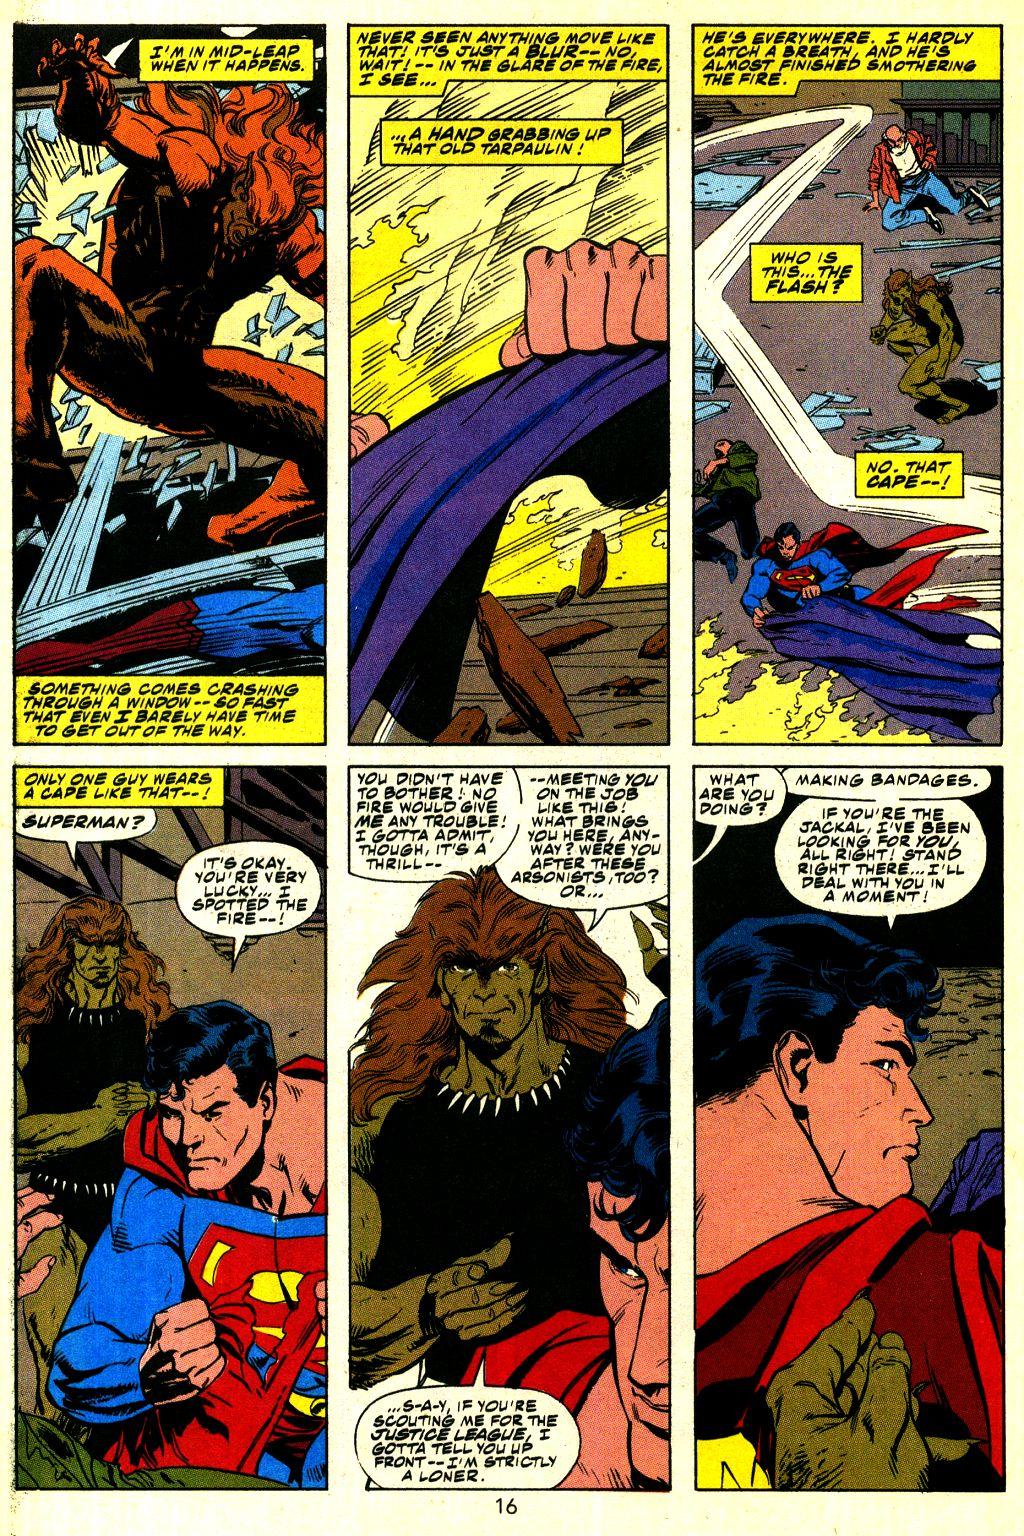 Action Comics (1938) 683 Page 16